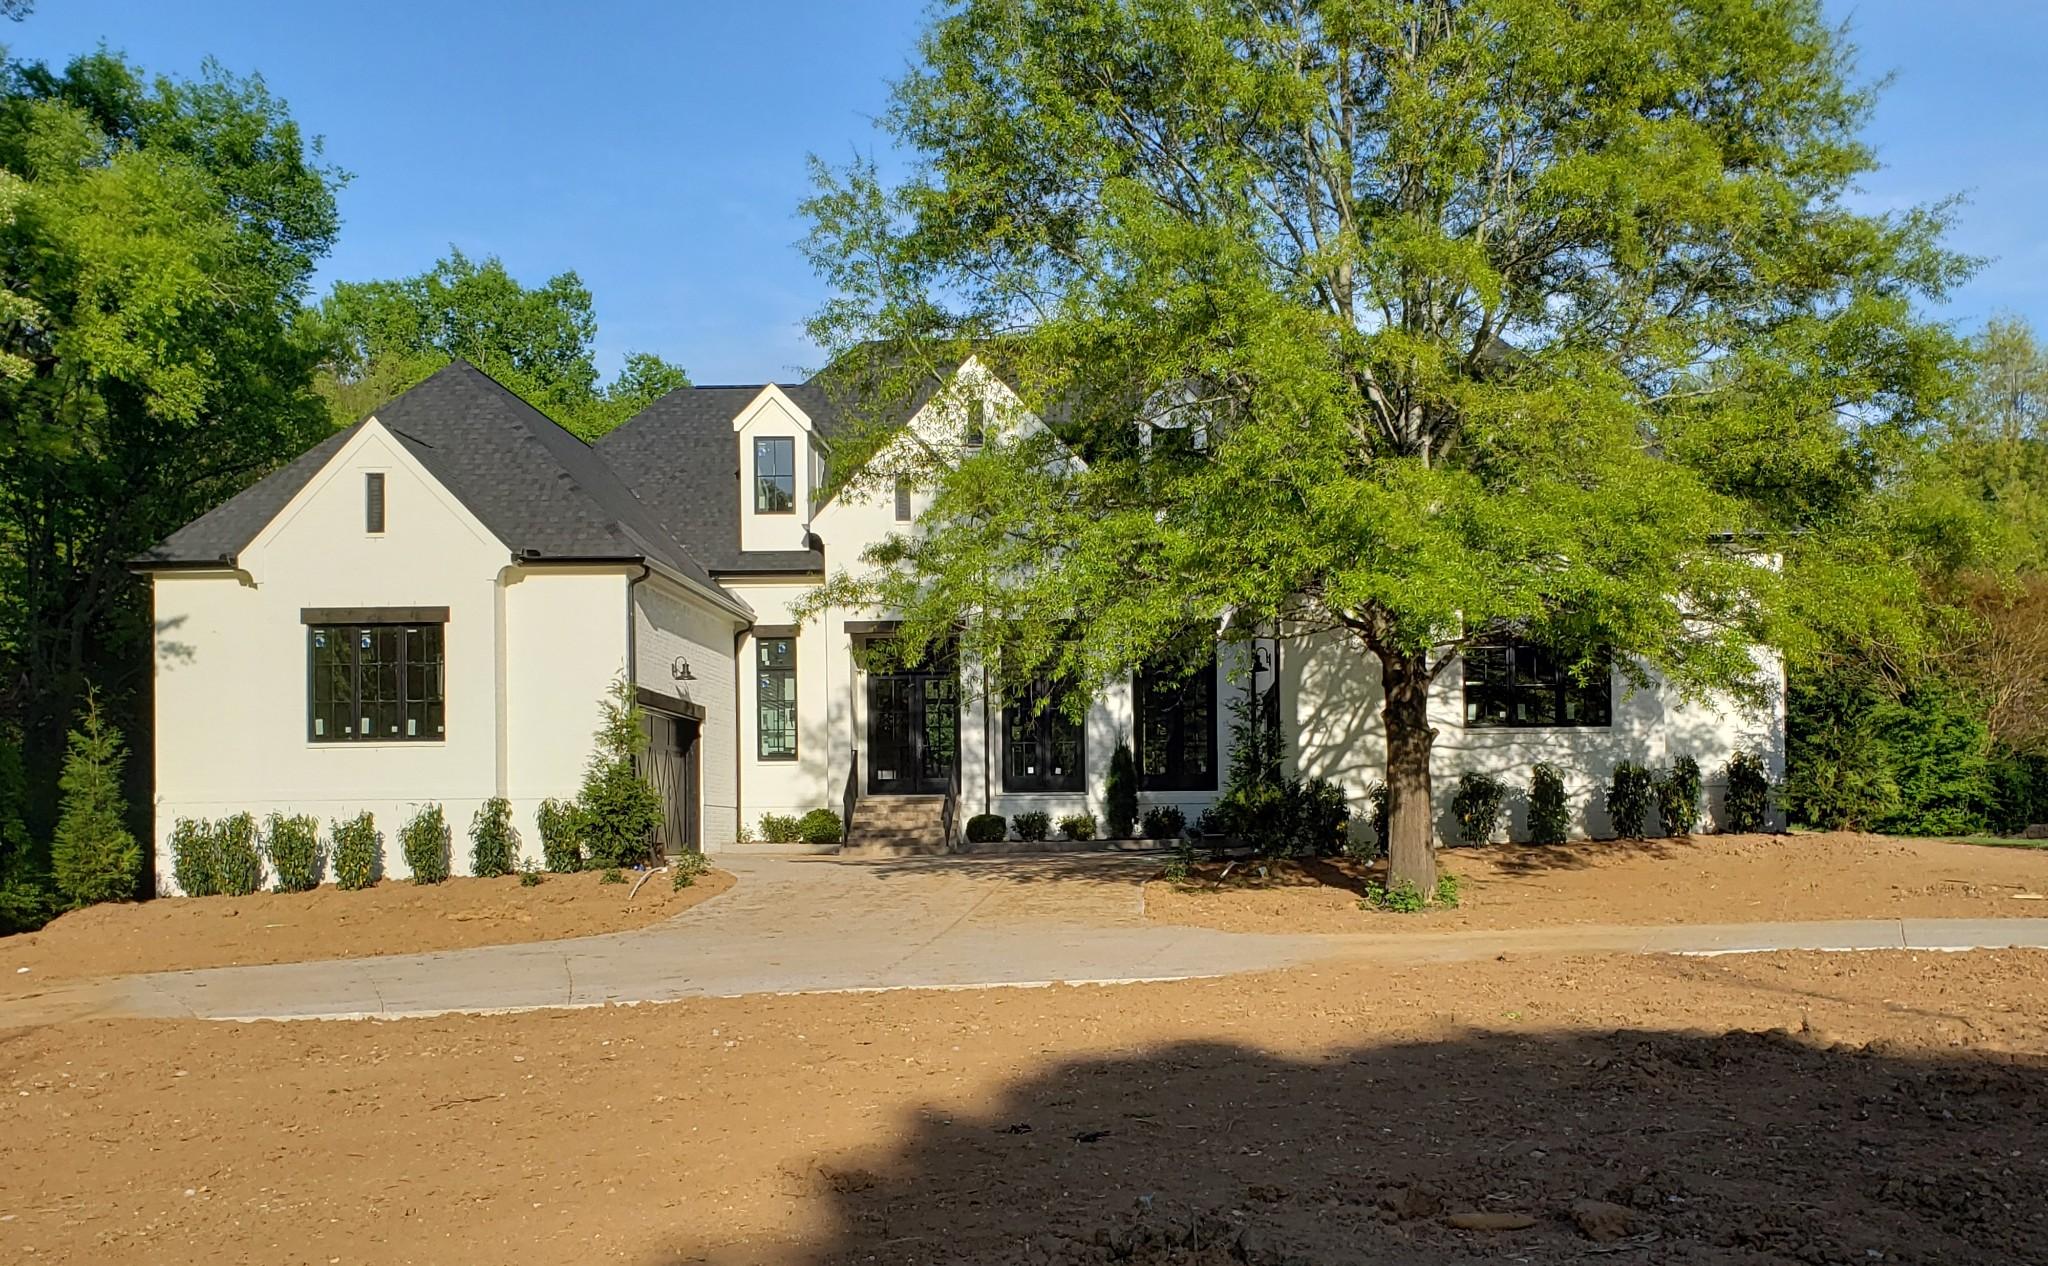 900 Shenandoah Dr, Brentwood, TN 37027 - Brentwood, TN real estate listing